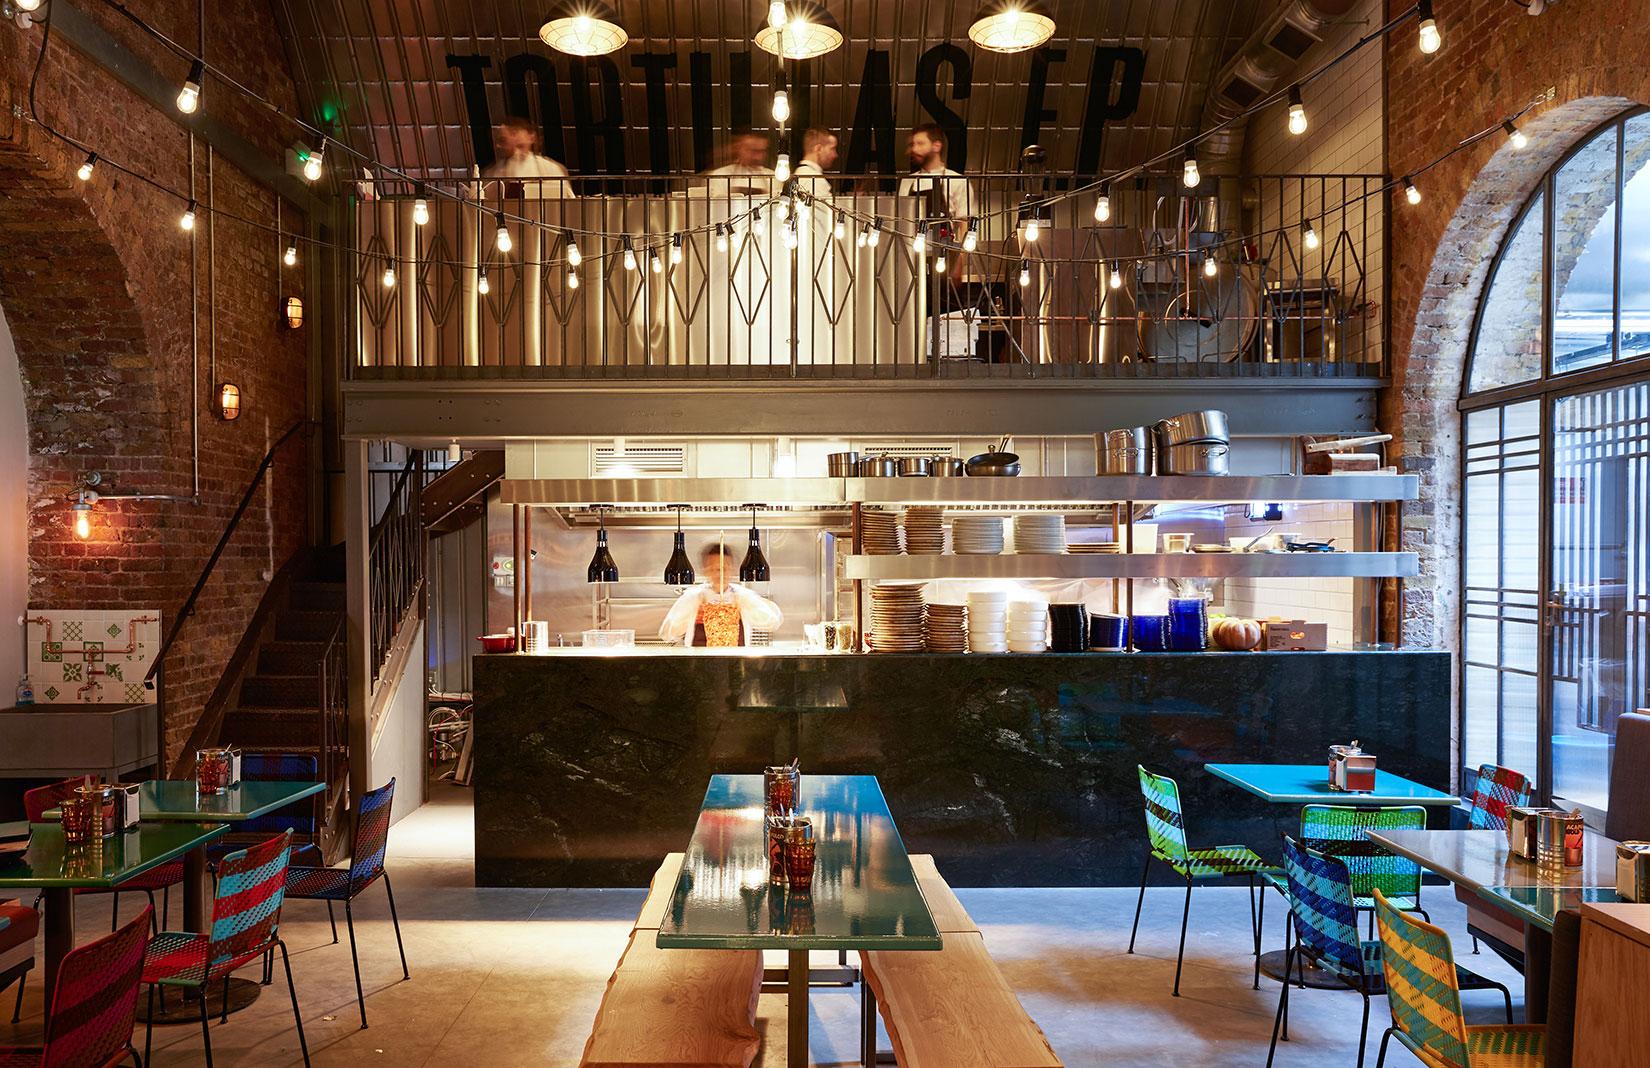 London restaurants: El Pastor